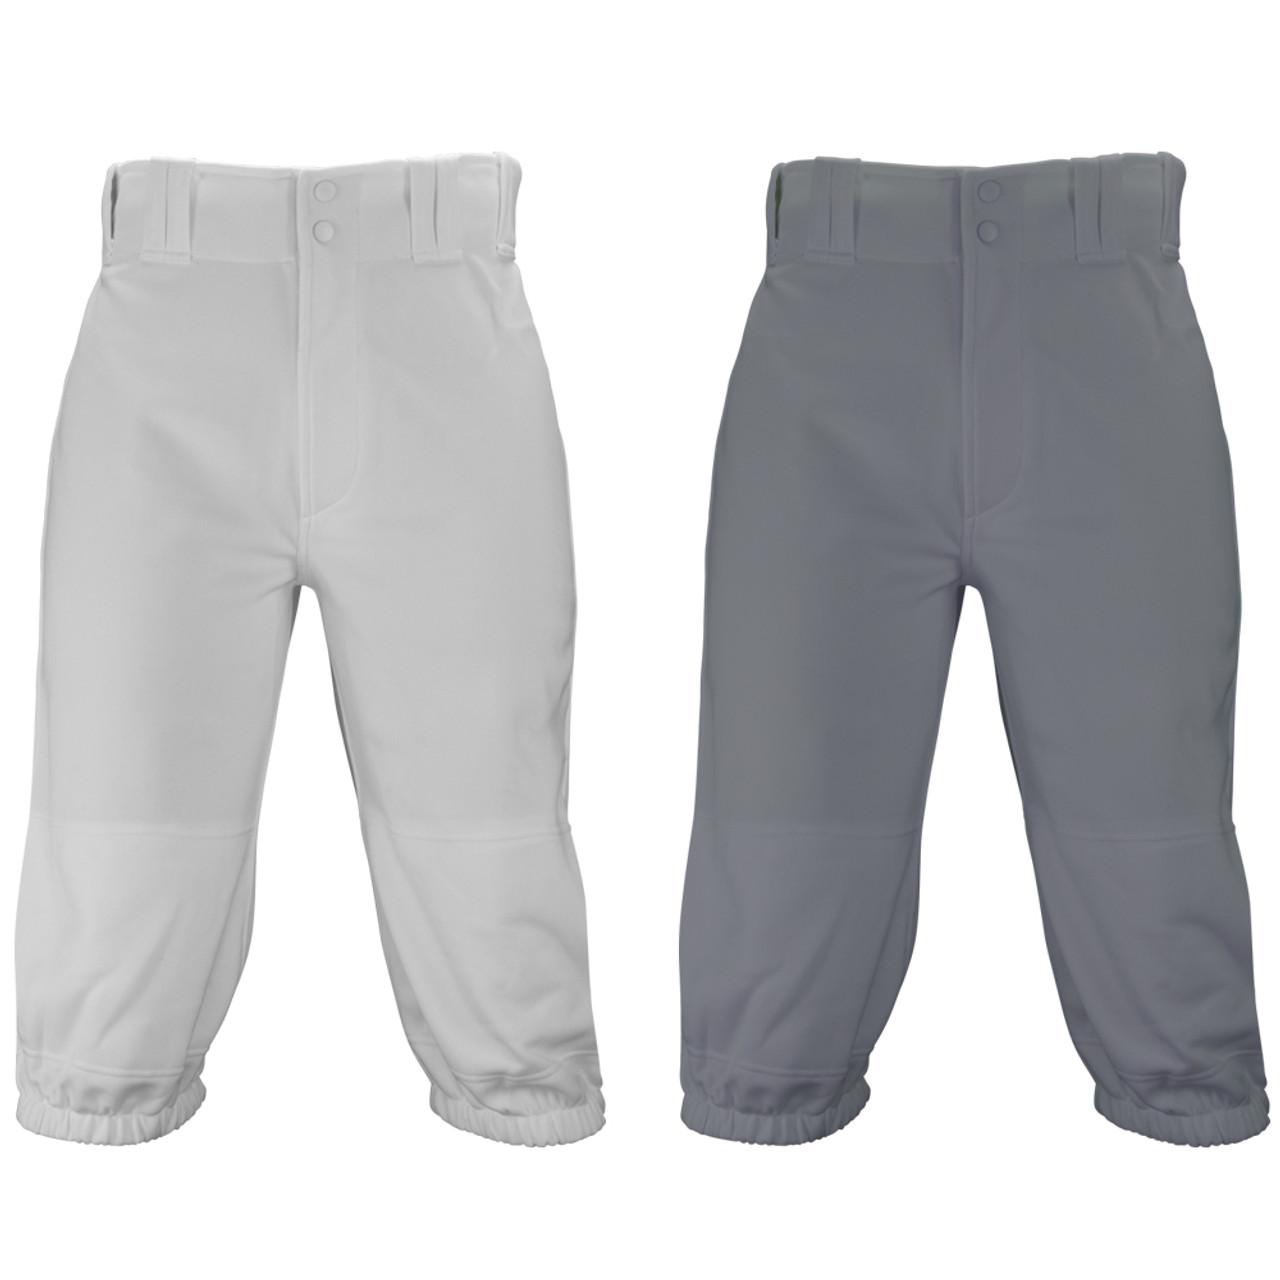 Marucci Doubleknit Short Pant Adult Baseball Pant MAPTDKSH